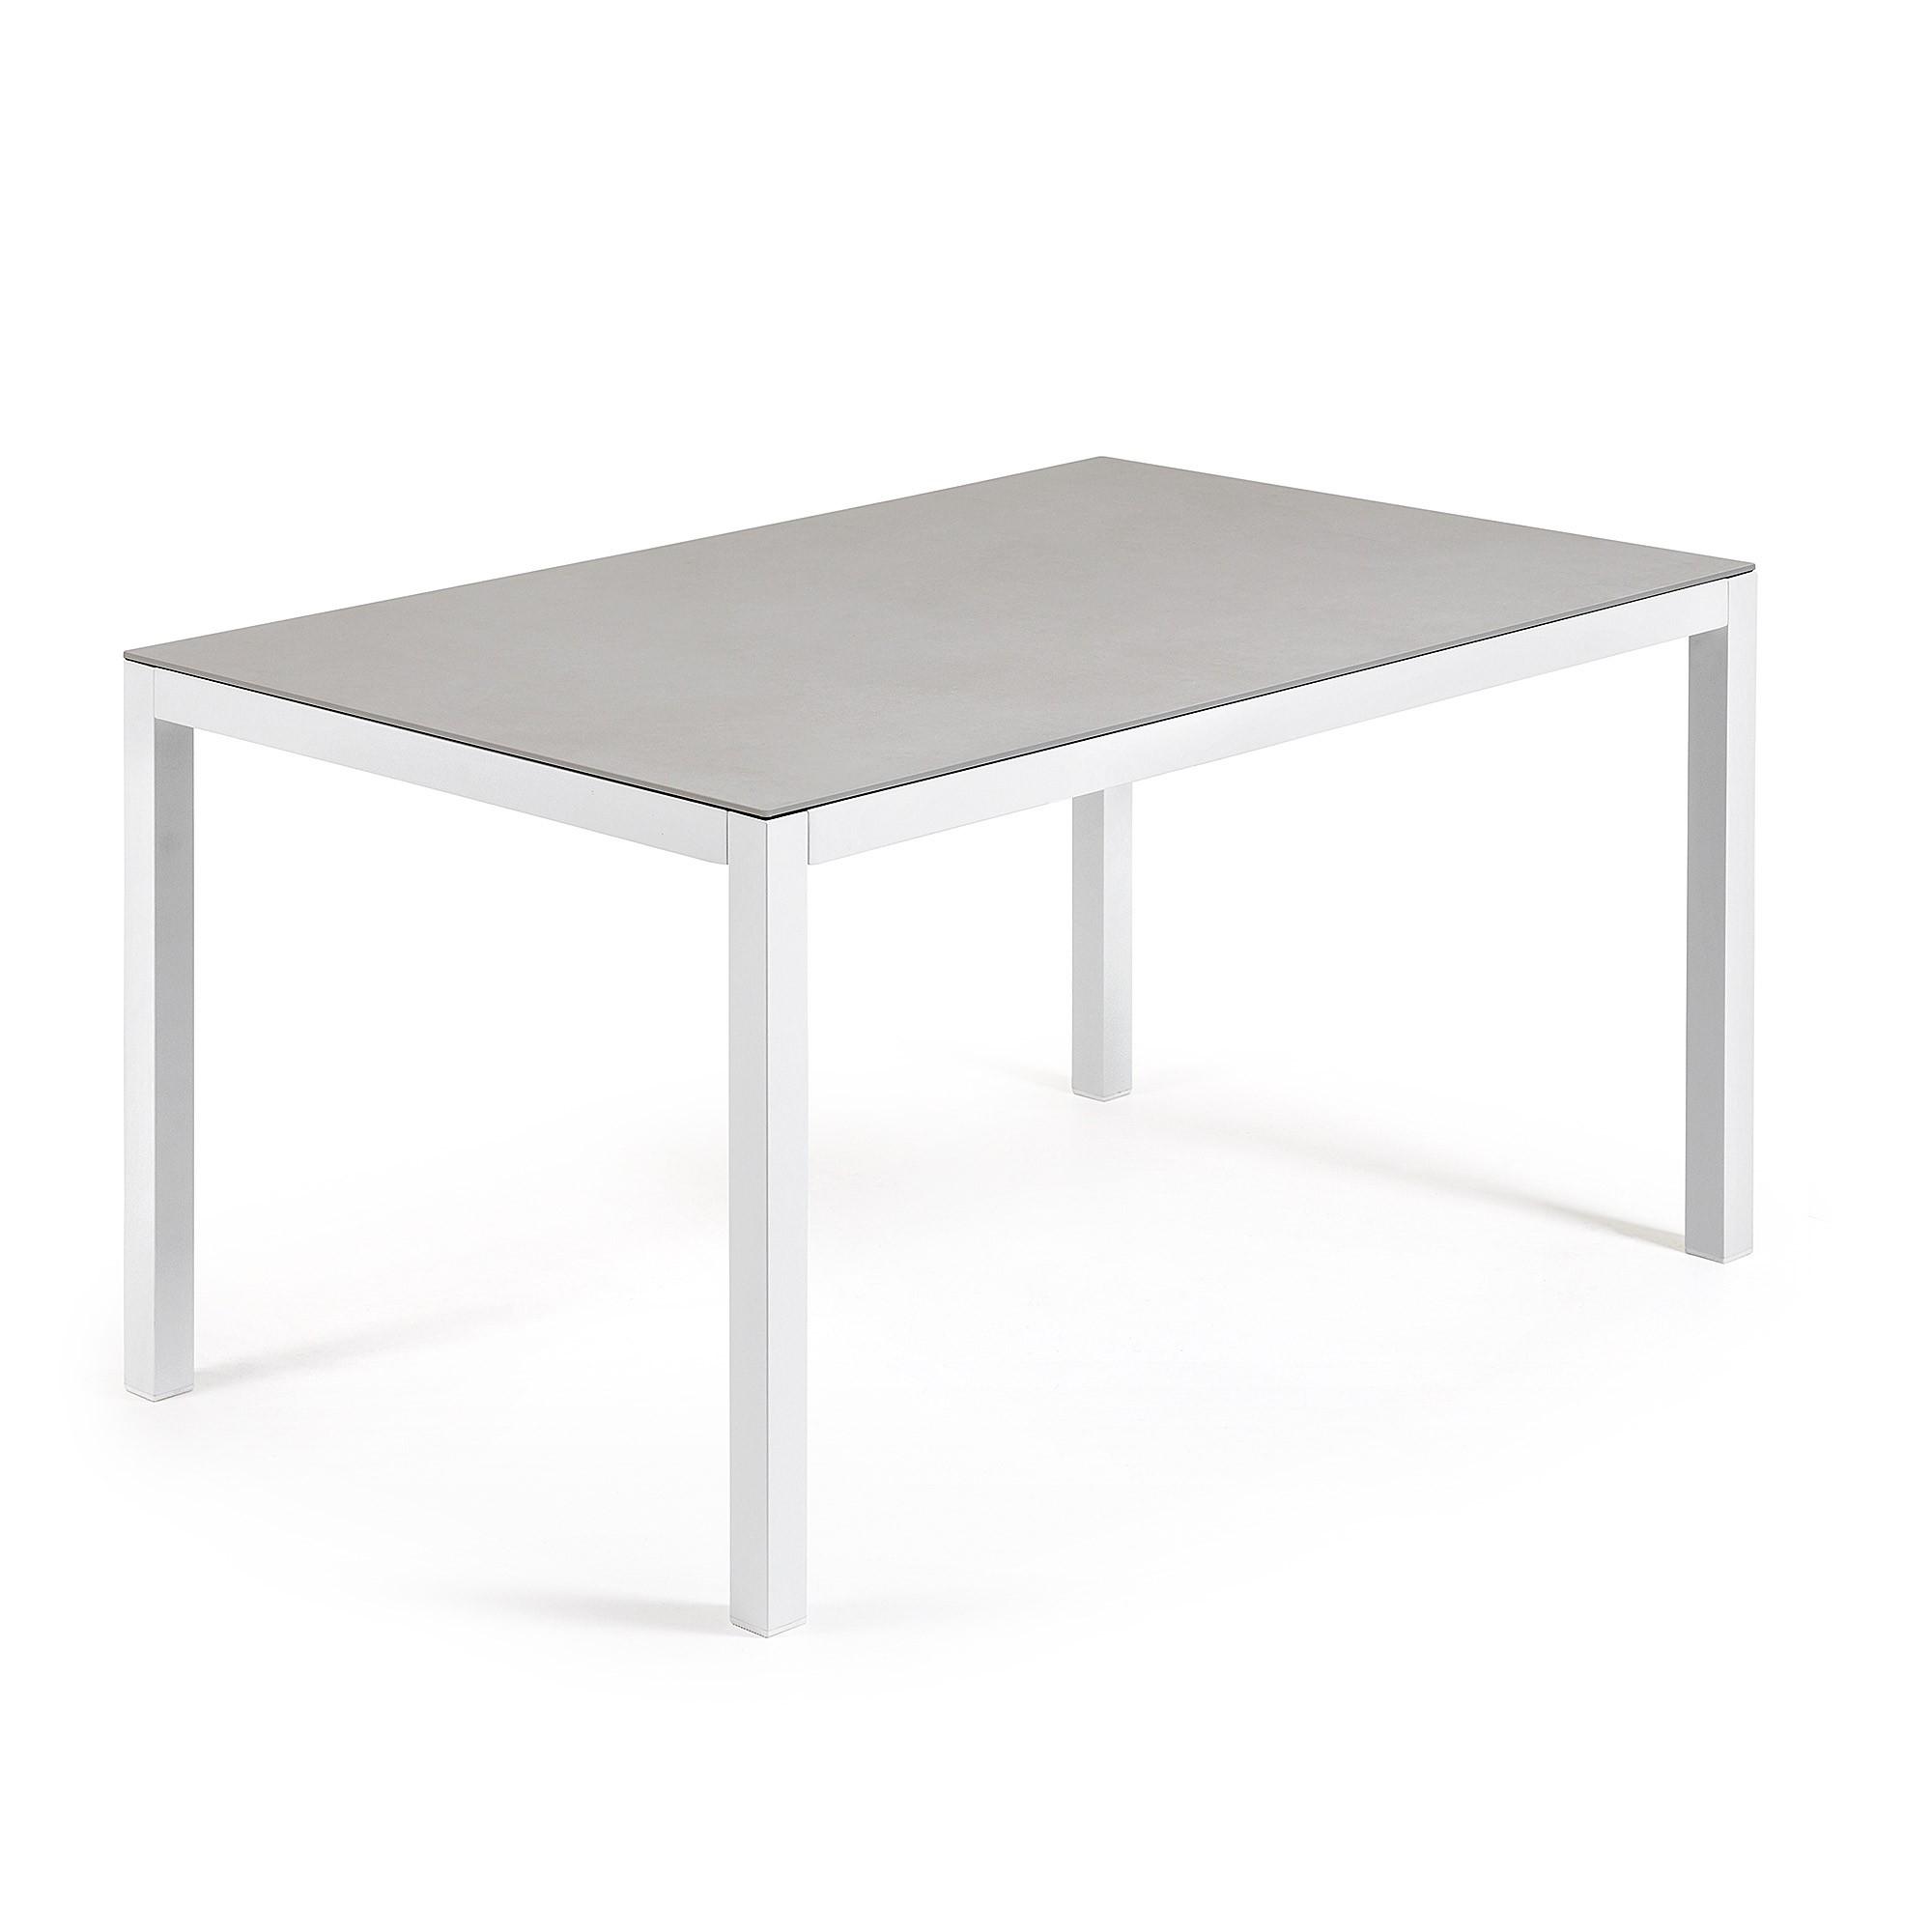 Blanca de 140 X 90 cm.